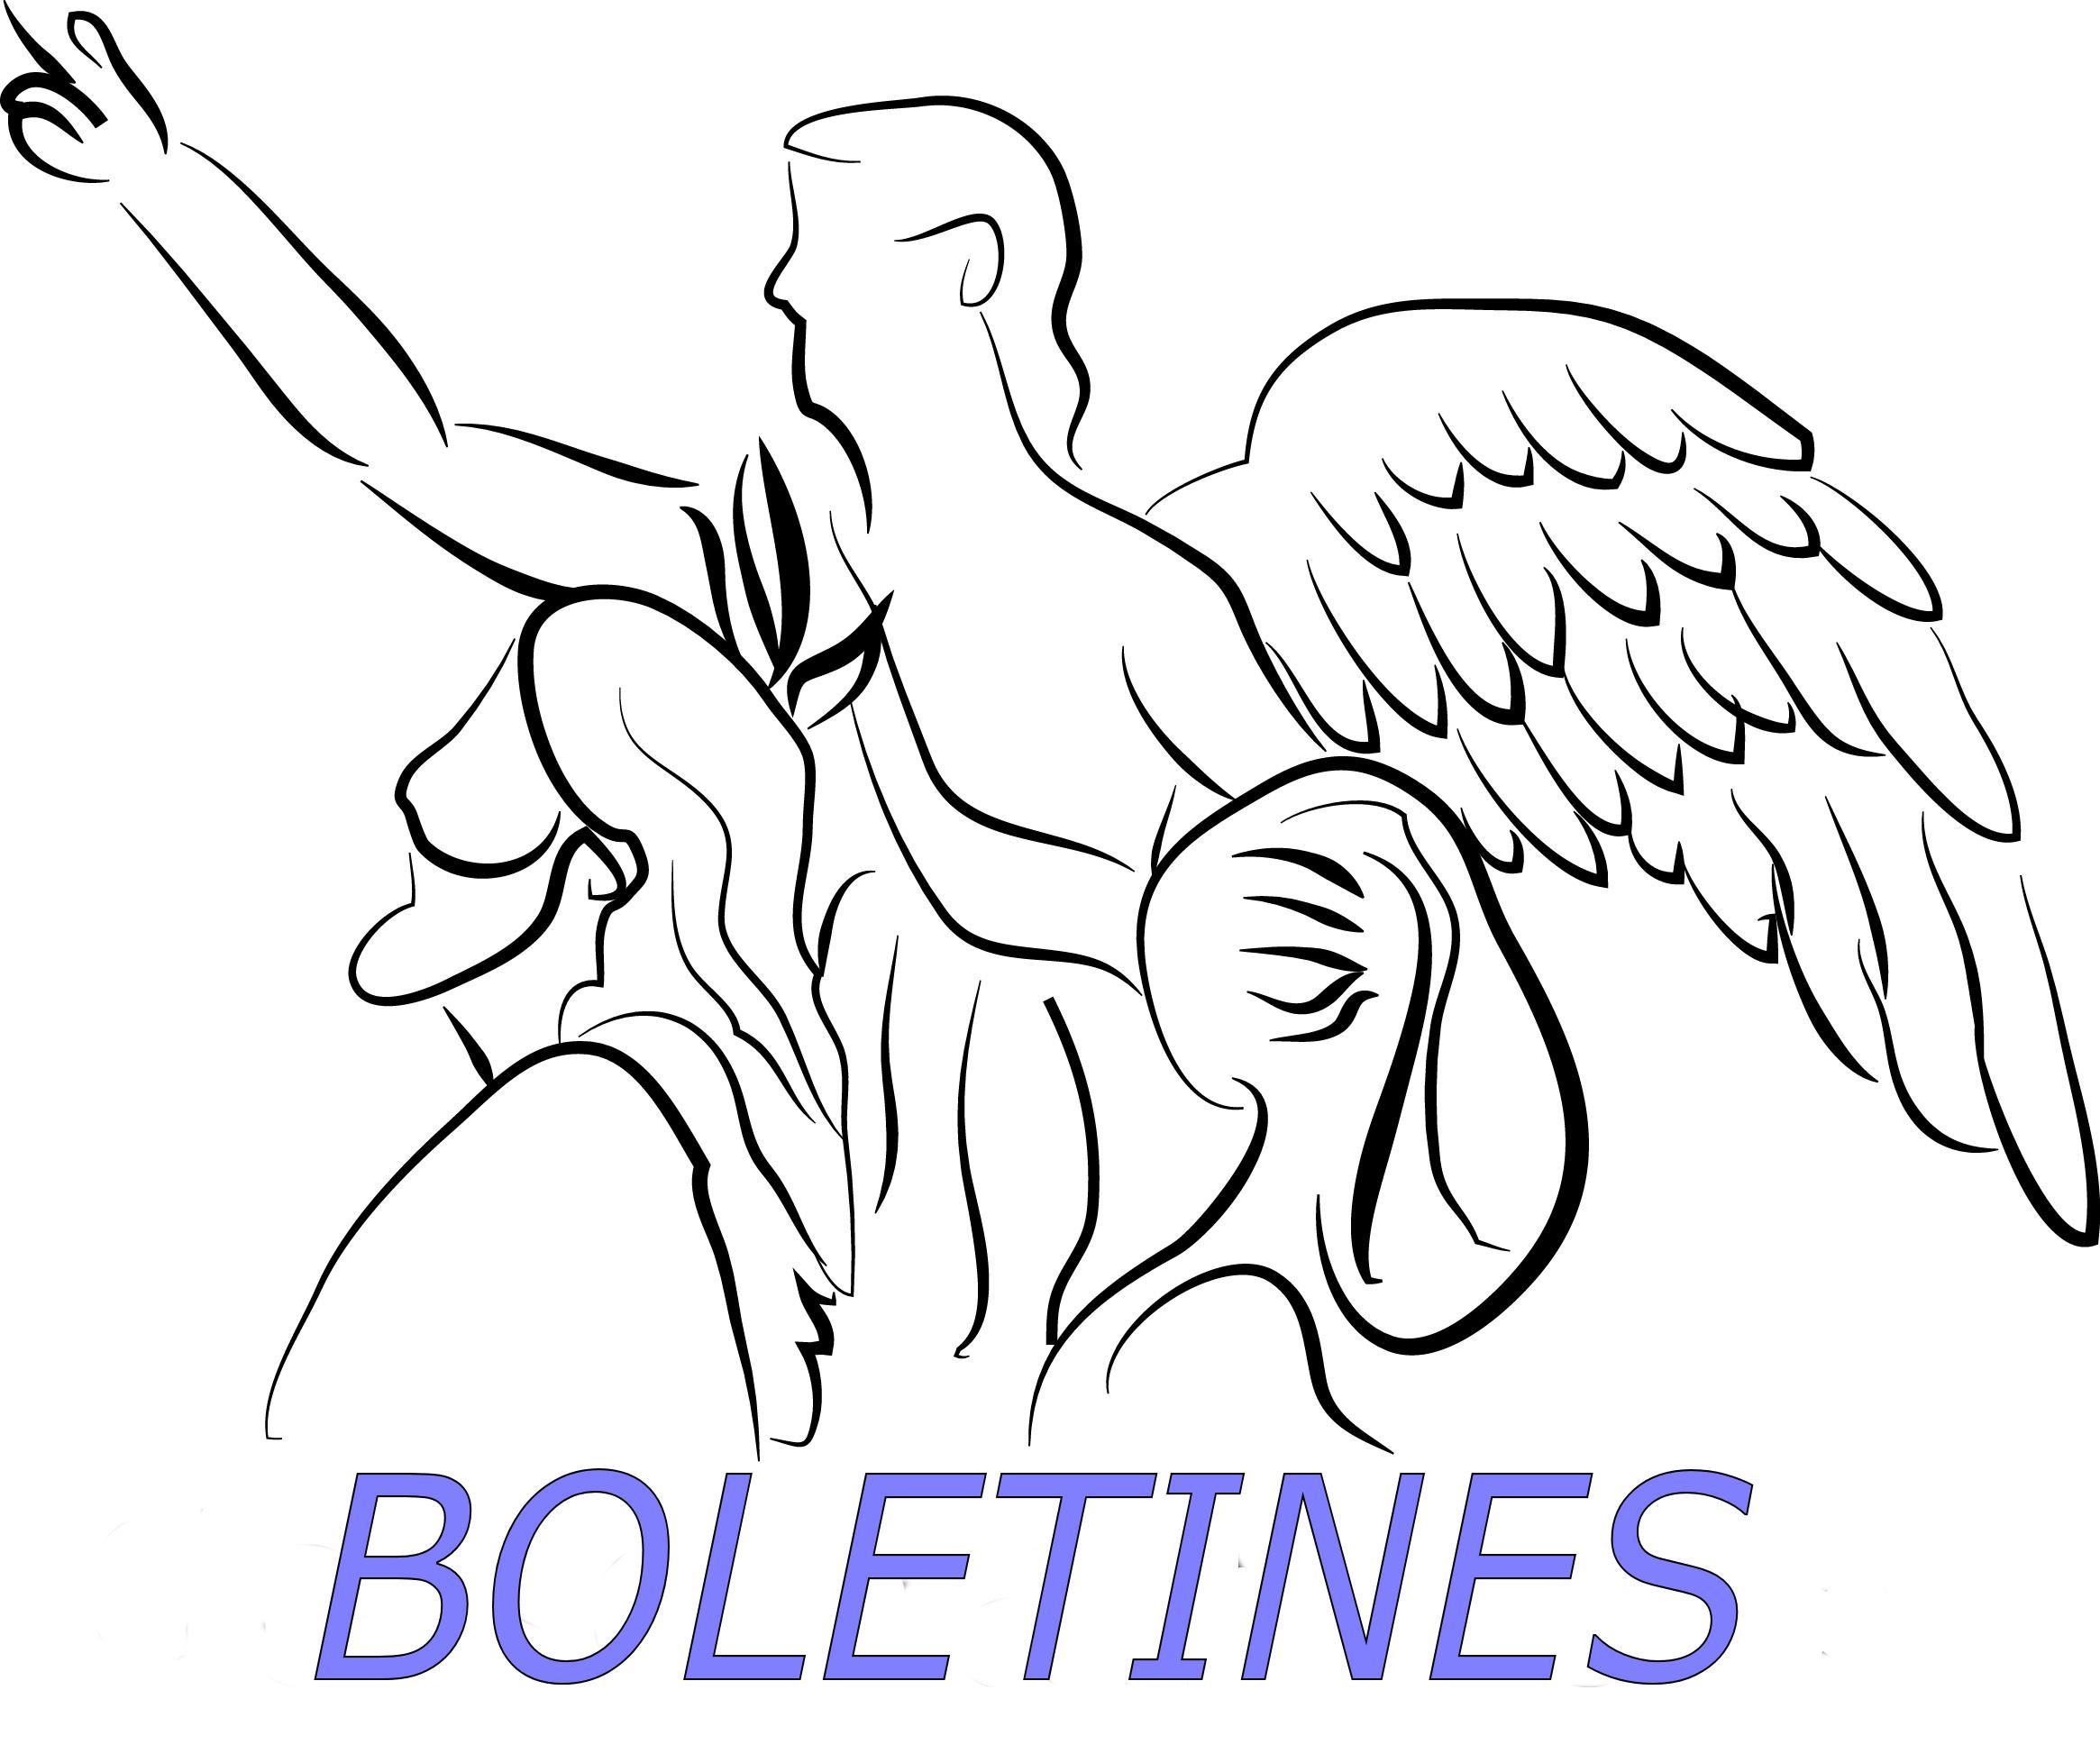 BOLETINES COLOR